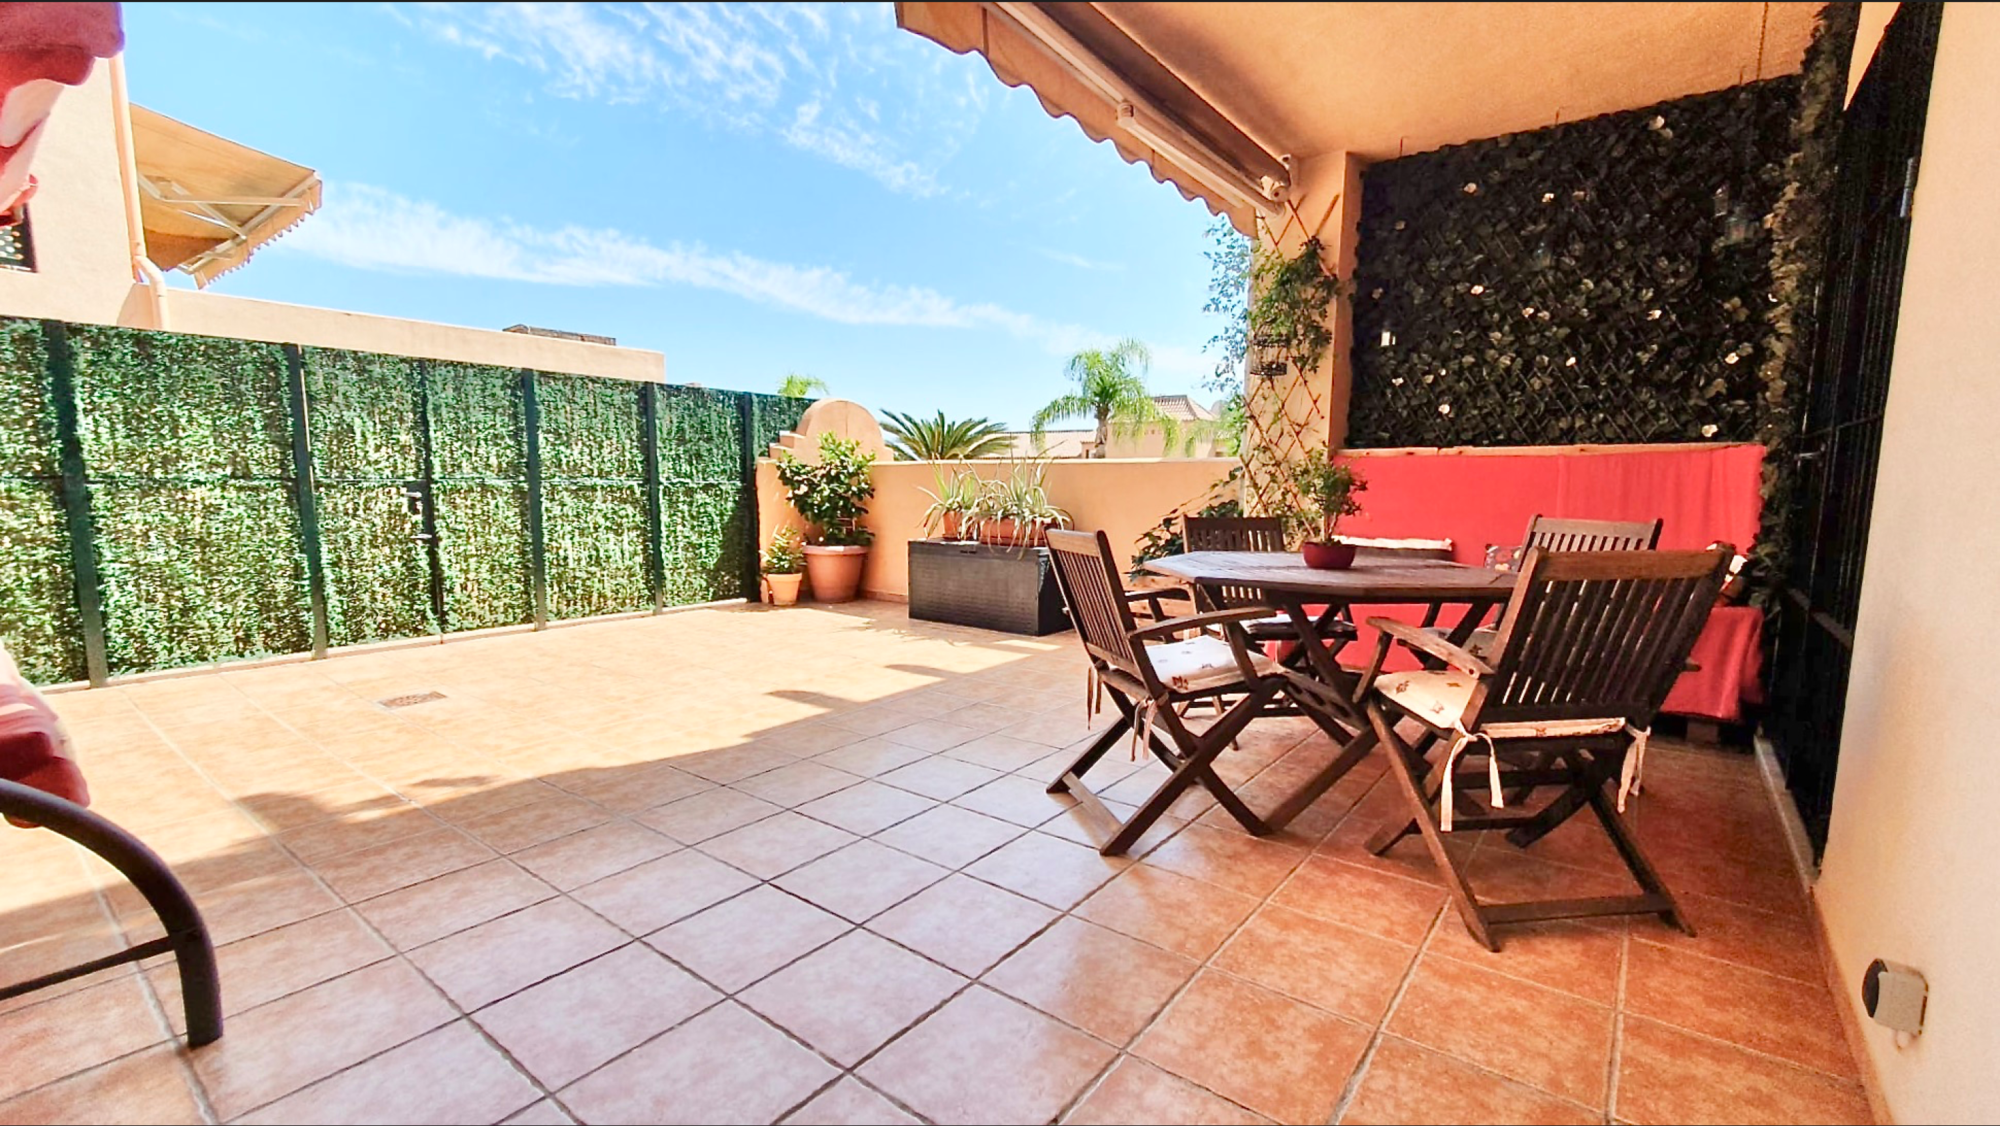 Apartment te koop in Mijas, El Faro